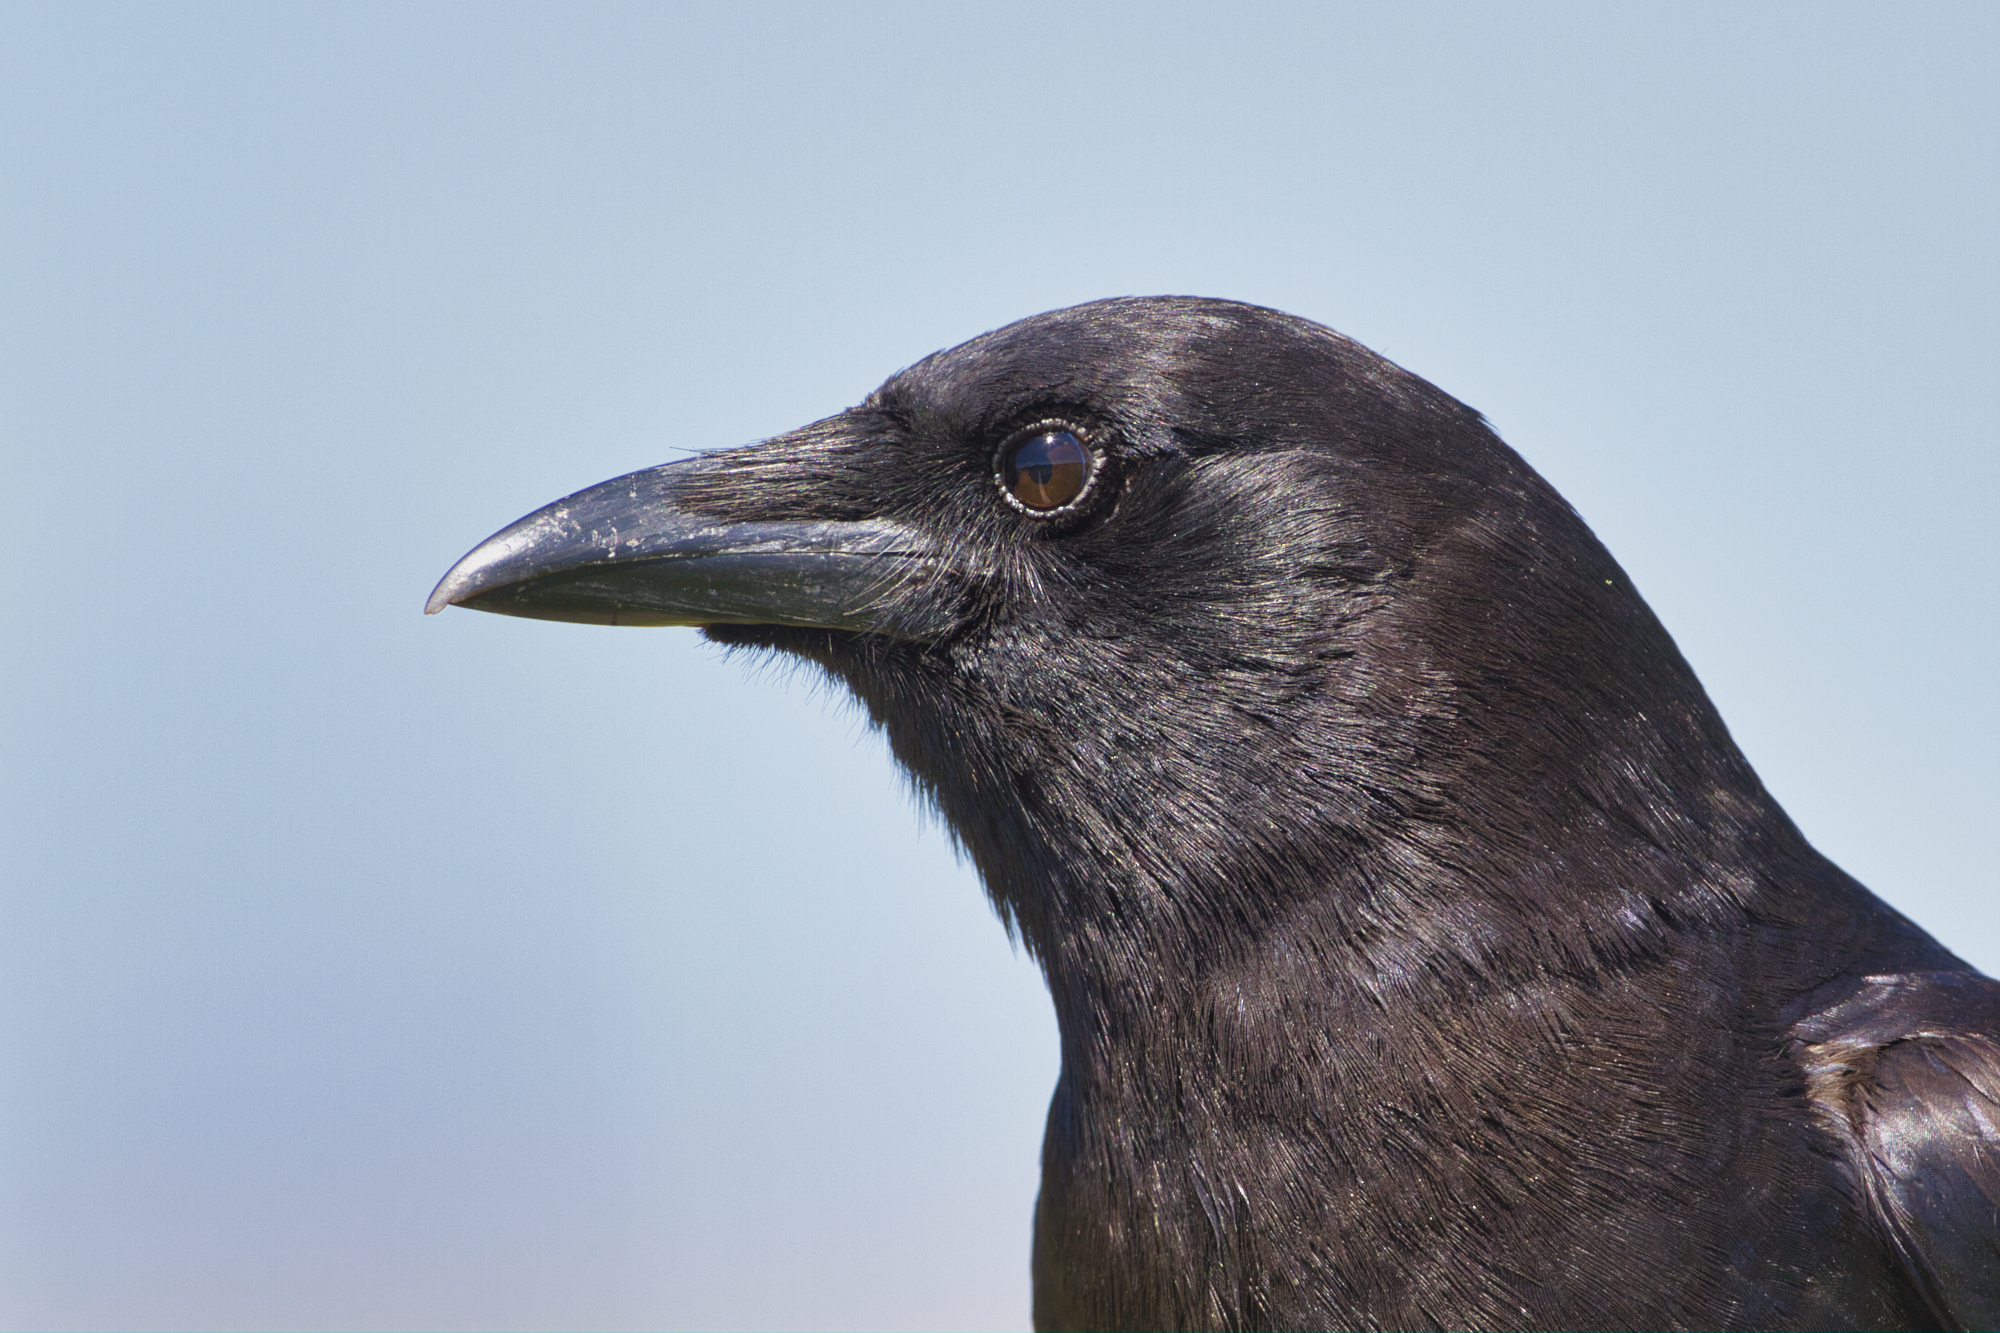 American Crow - Wichita Mountains Wildlife Refuge - Oklahoma